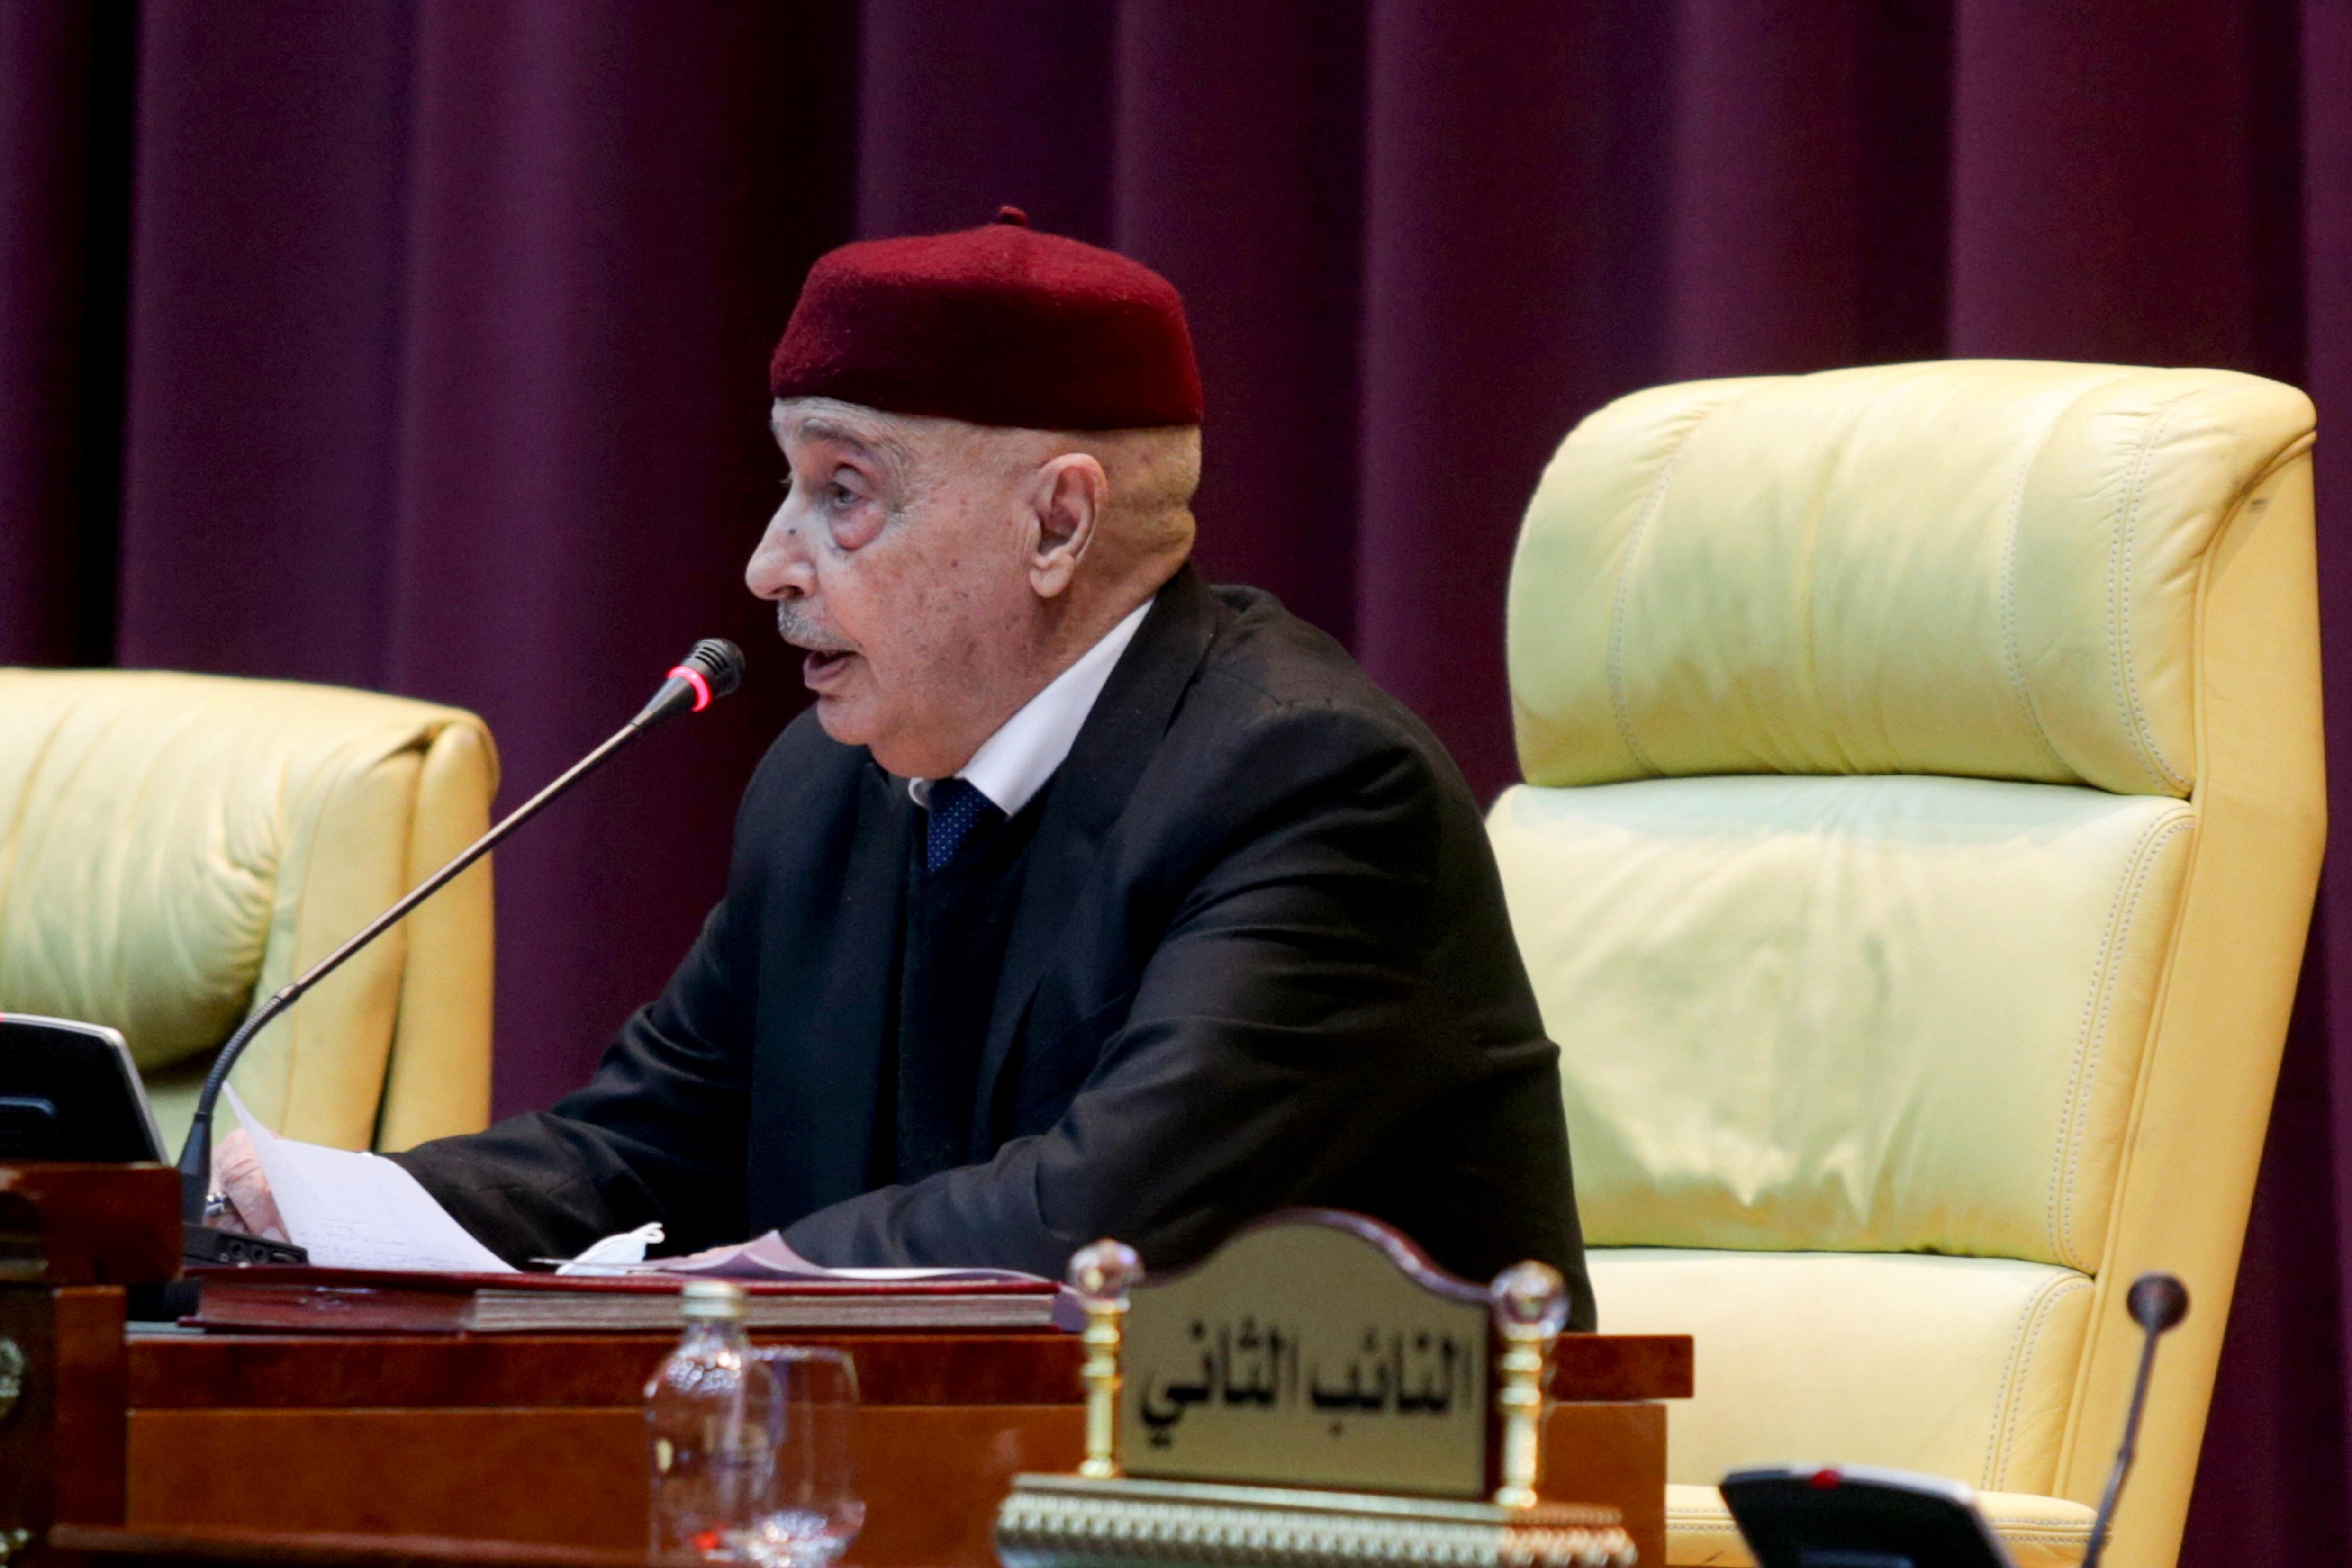 Parliament head Aguila Saleh attends a session to discuss approving new government, in Sirte, Libya March 8, 2021. REUTERS/Esam Omran Al-Fetori/File Photo